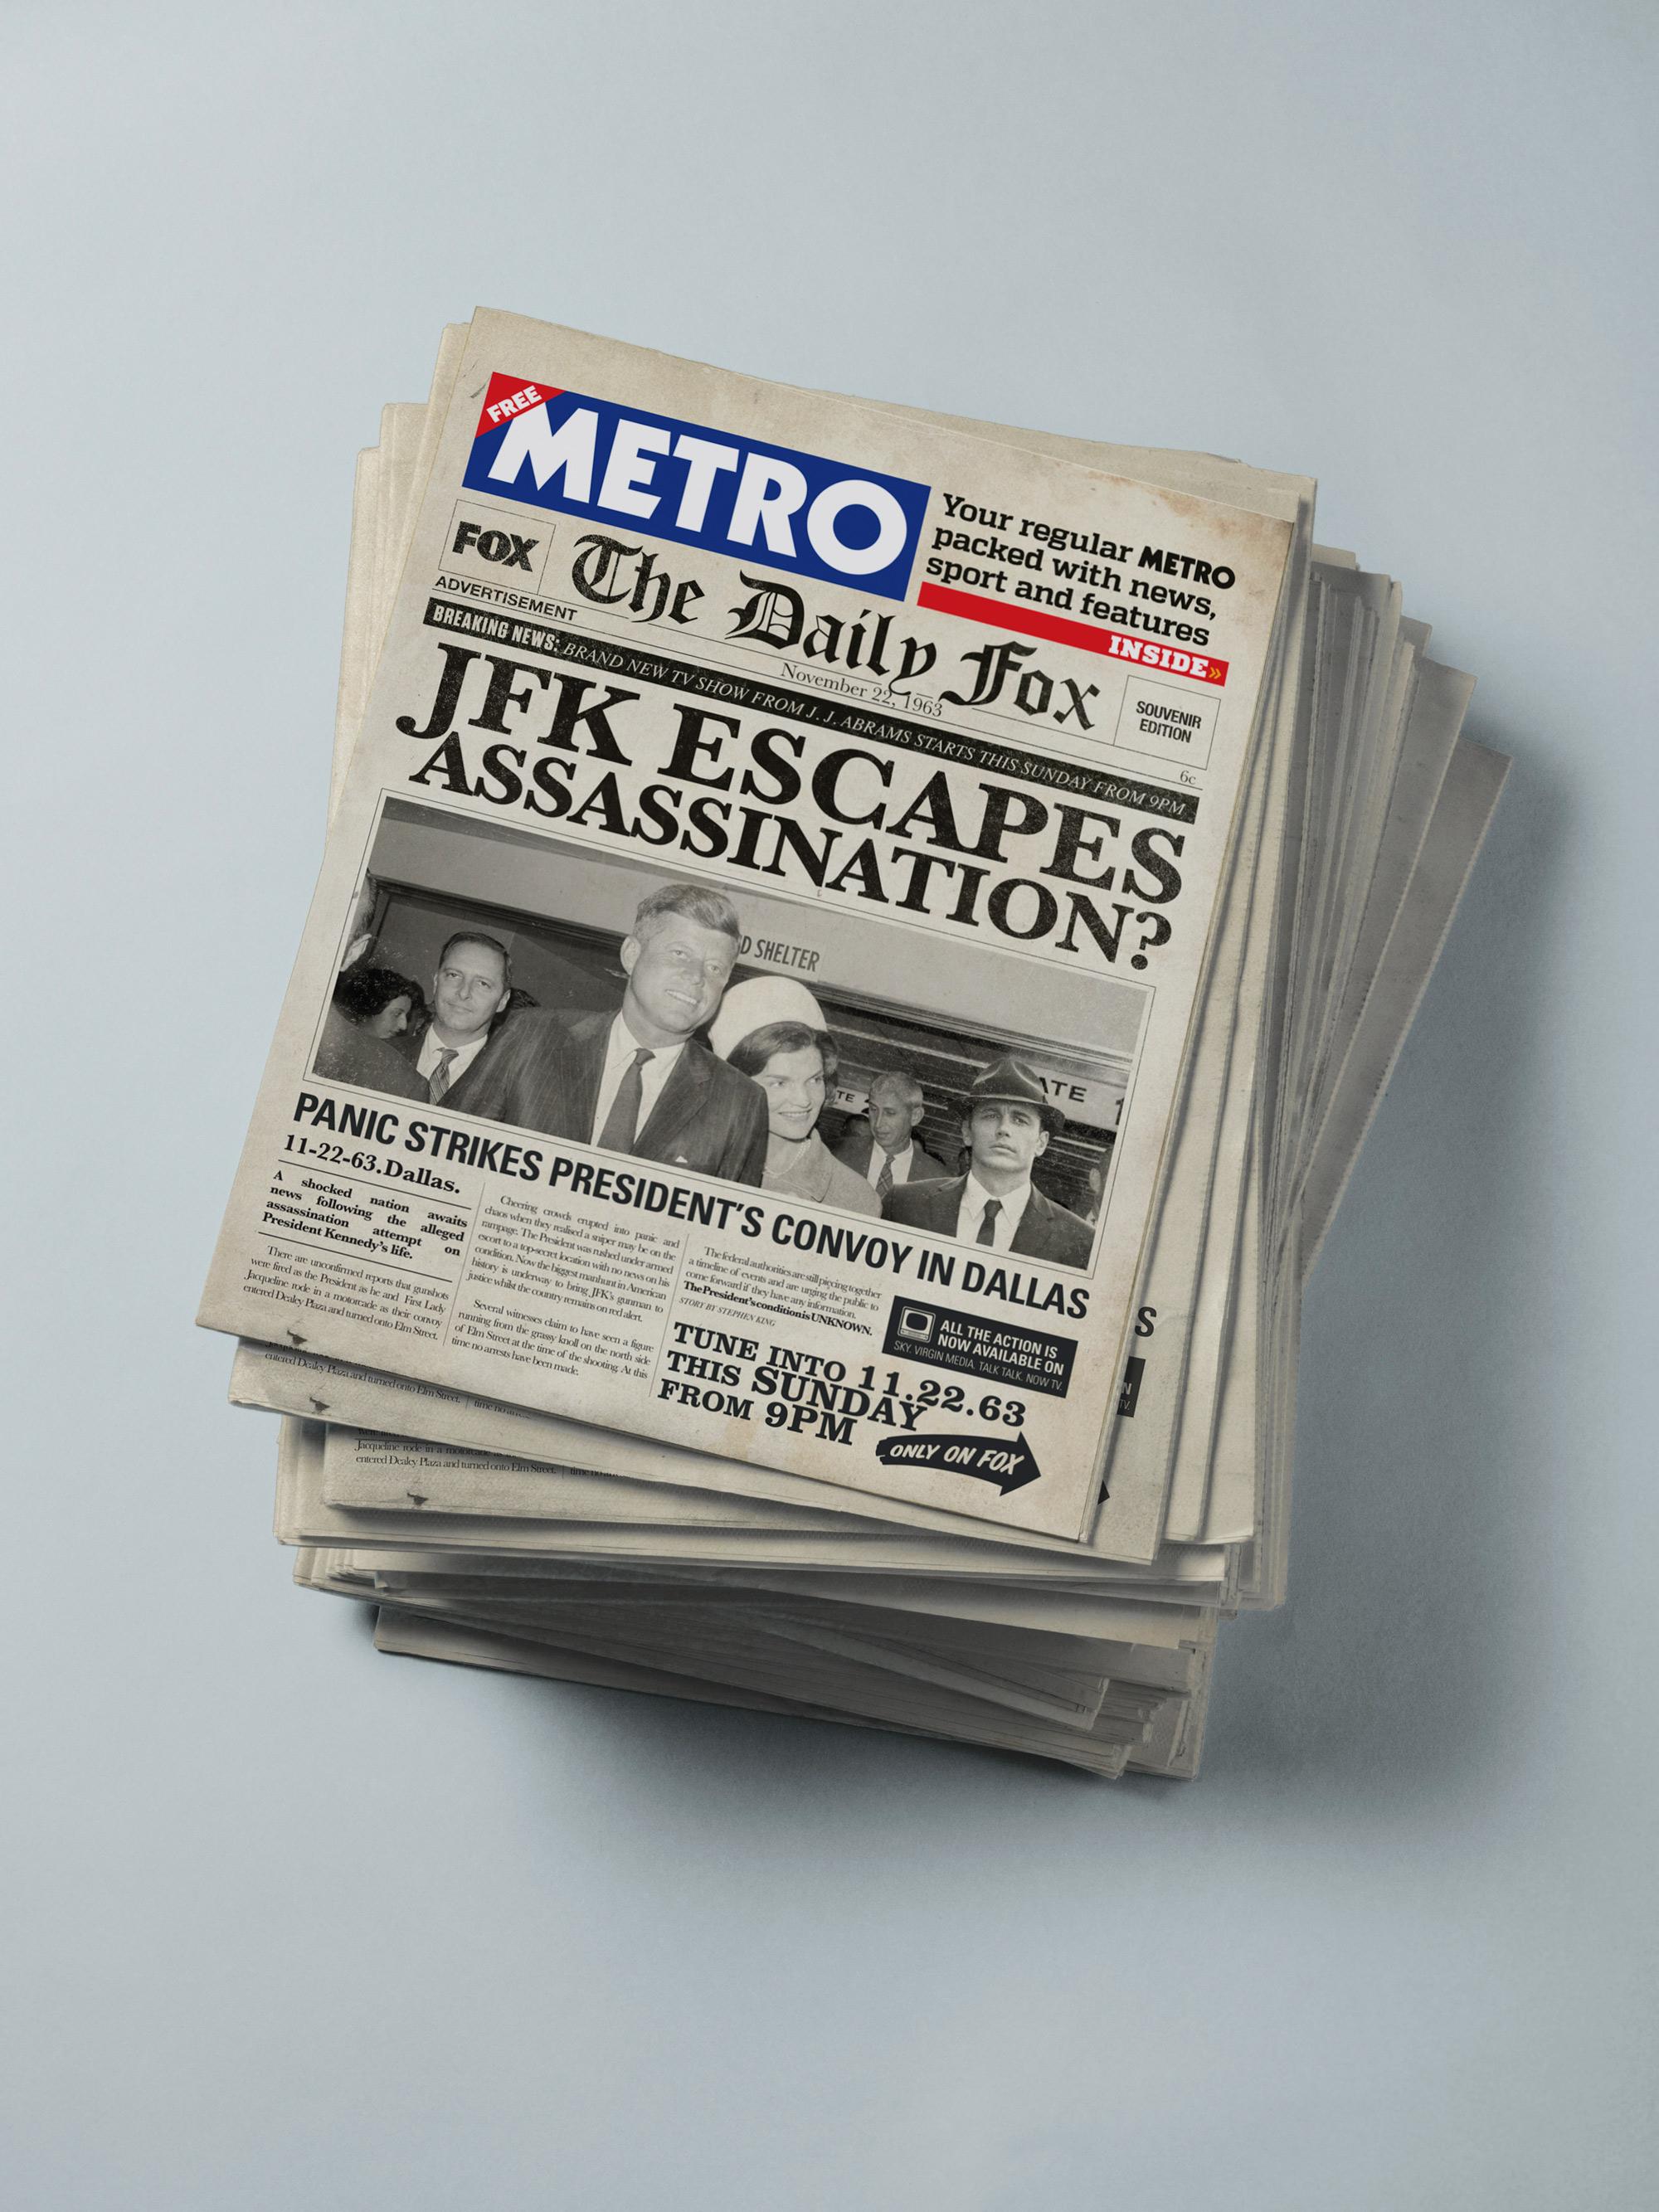 11_22_63_newspaper-metro-2